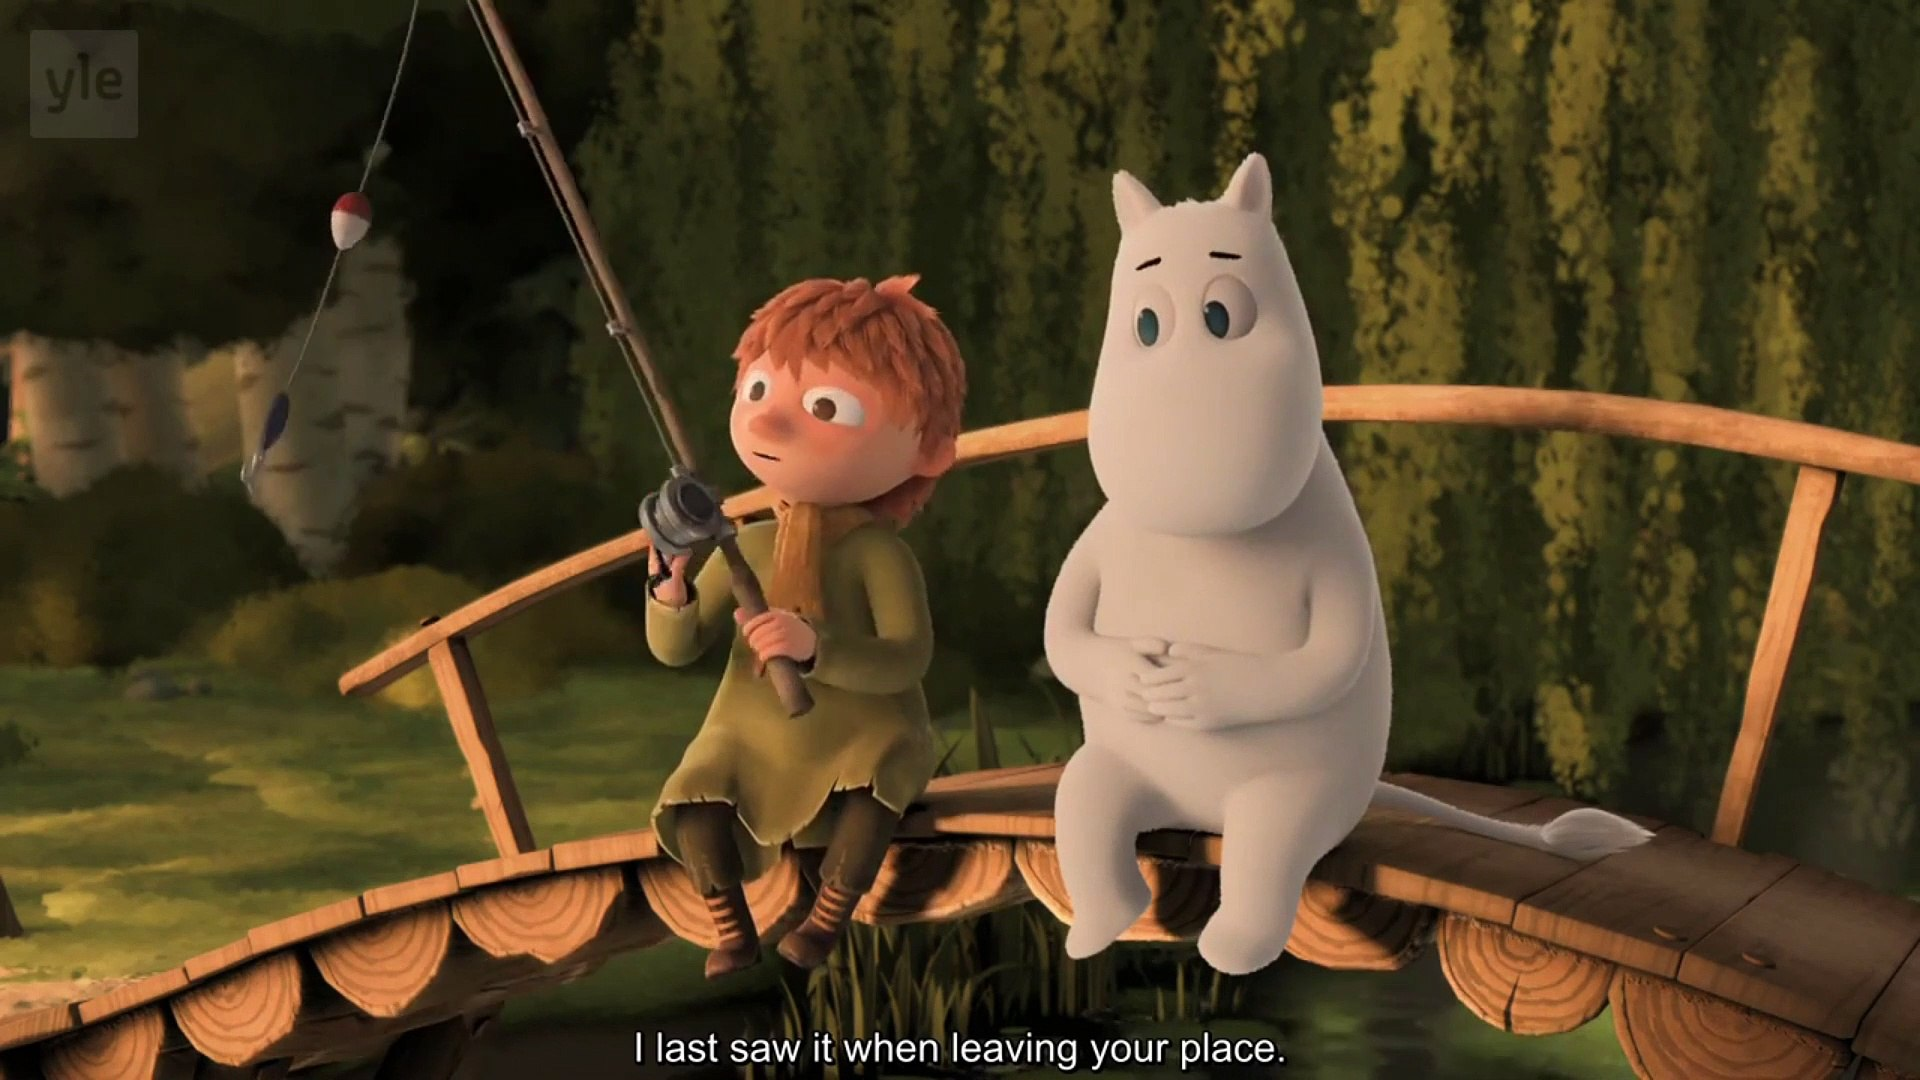 Moomin Snufkin sweet moment Moominvalley 2019